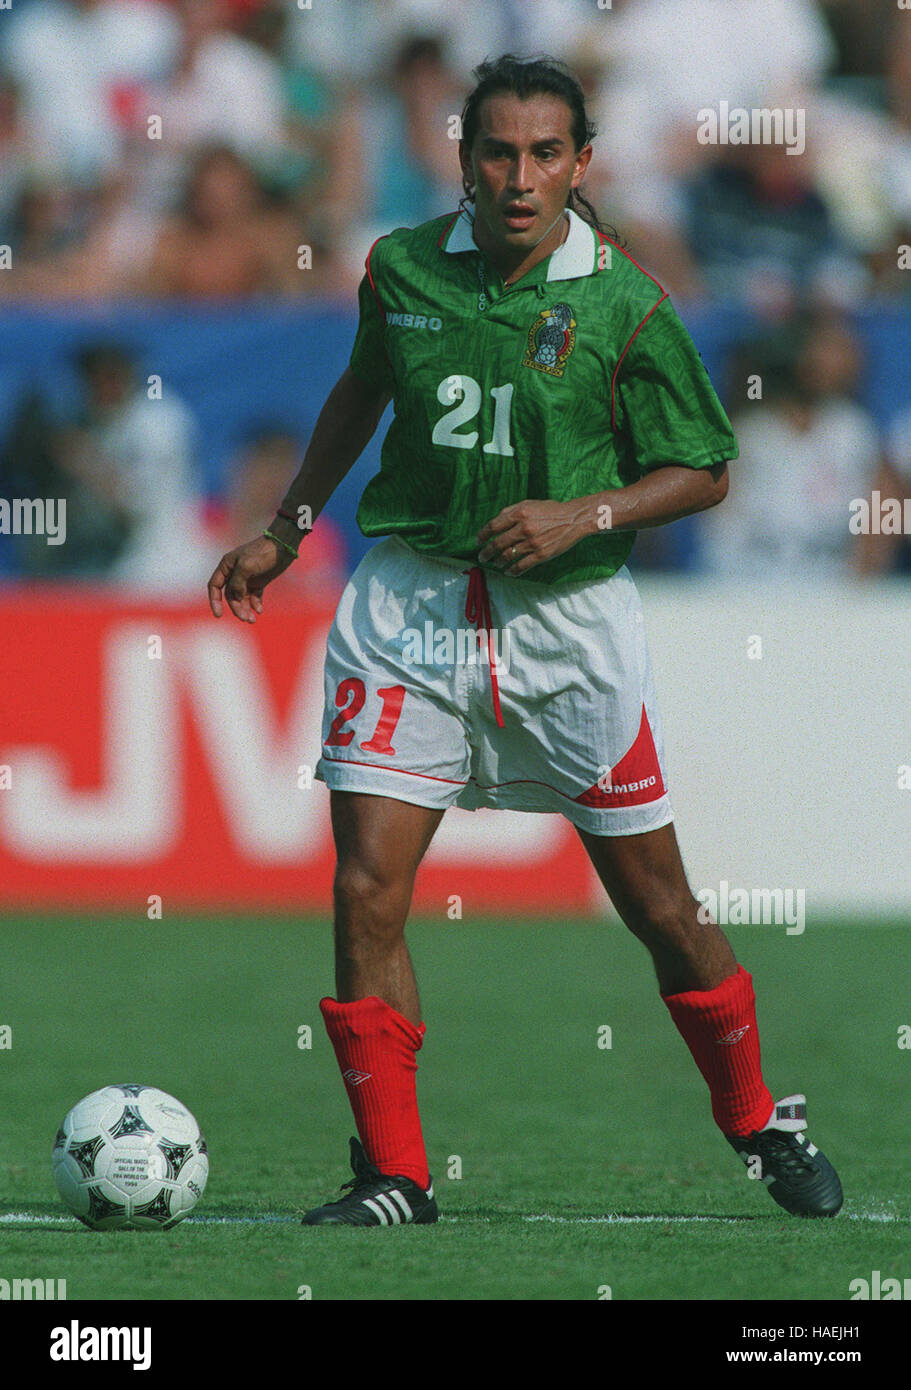 RAUL GUTIERREZ MEXICO 22 July 1994 - Stock Image